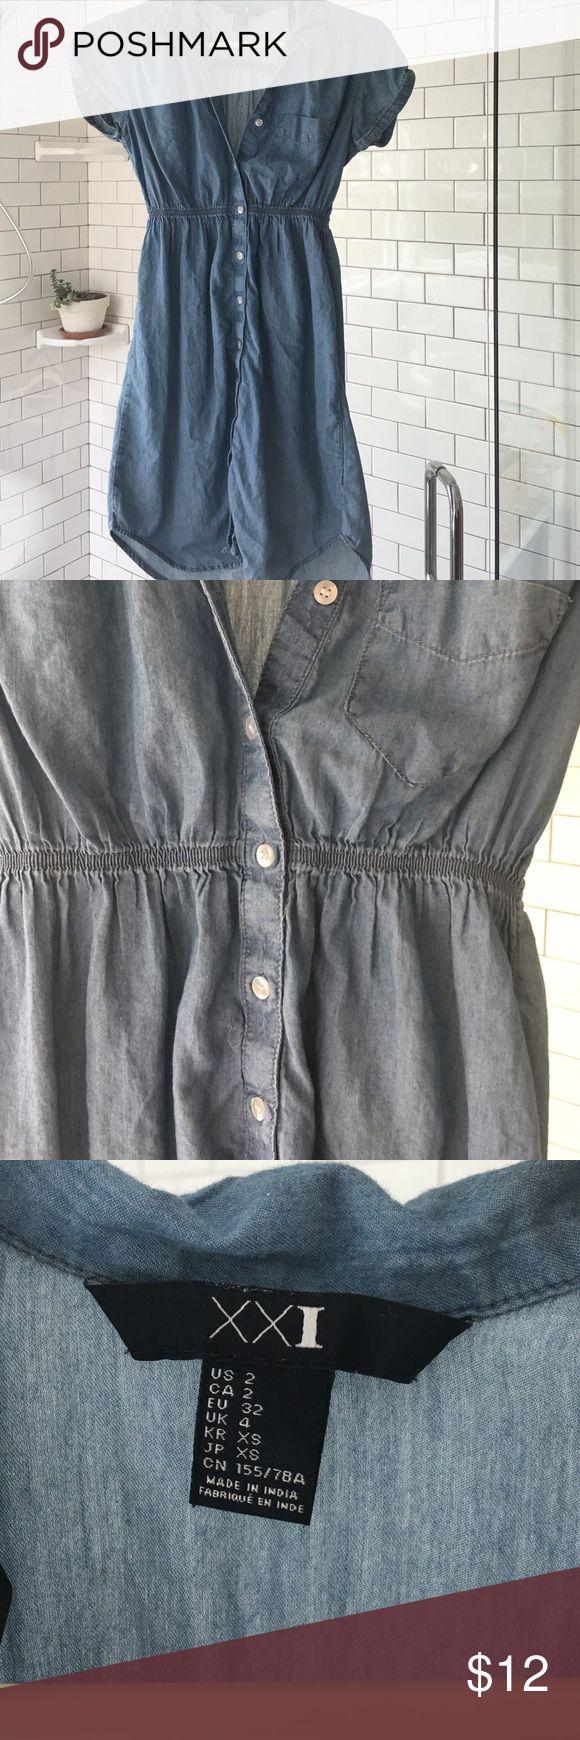 Denim shirt dress Soft denim button down shirt dress Forever 21 Dresses